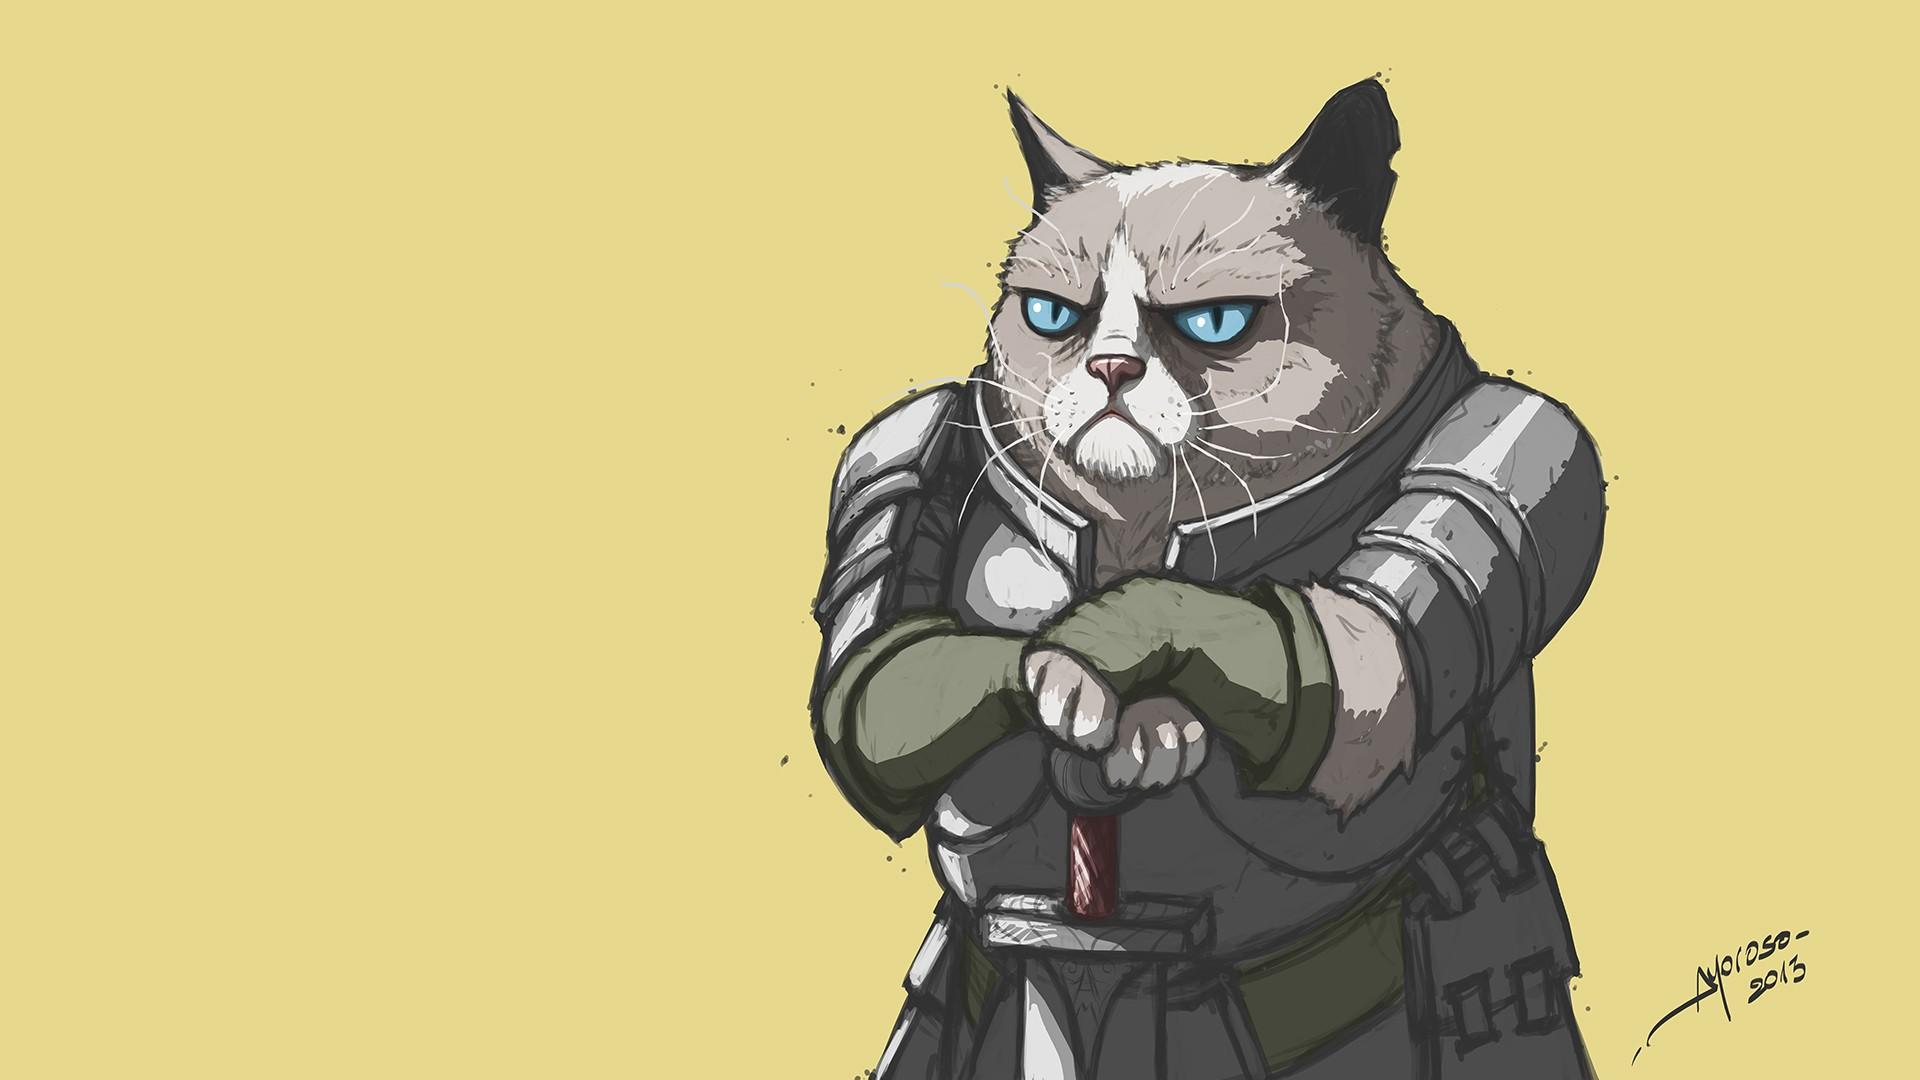 General 1920x1080 digital art Grumpy Cat memes warrior humor cats knight artwork simple background blue eyes sword armor